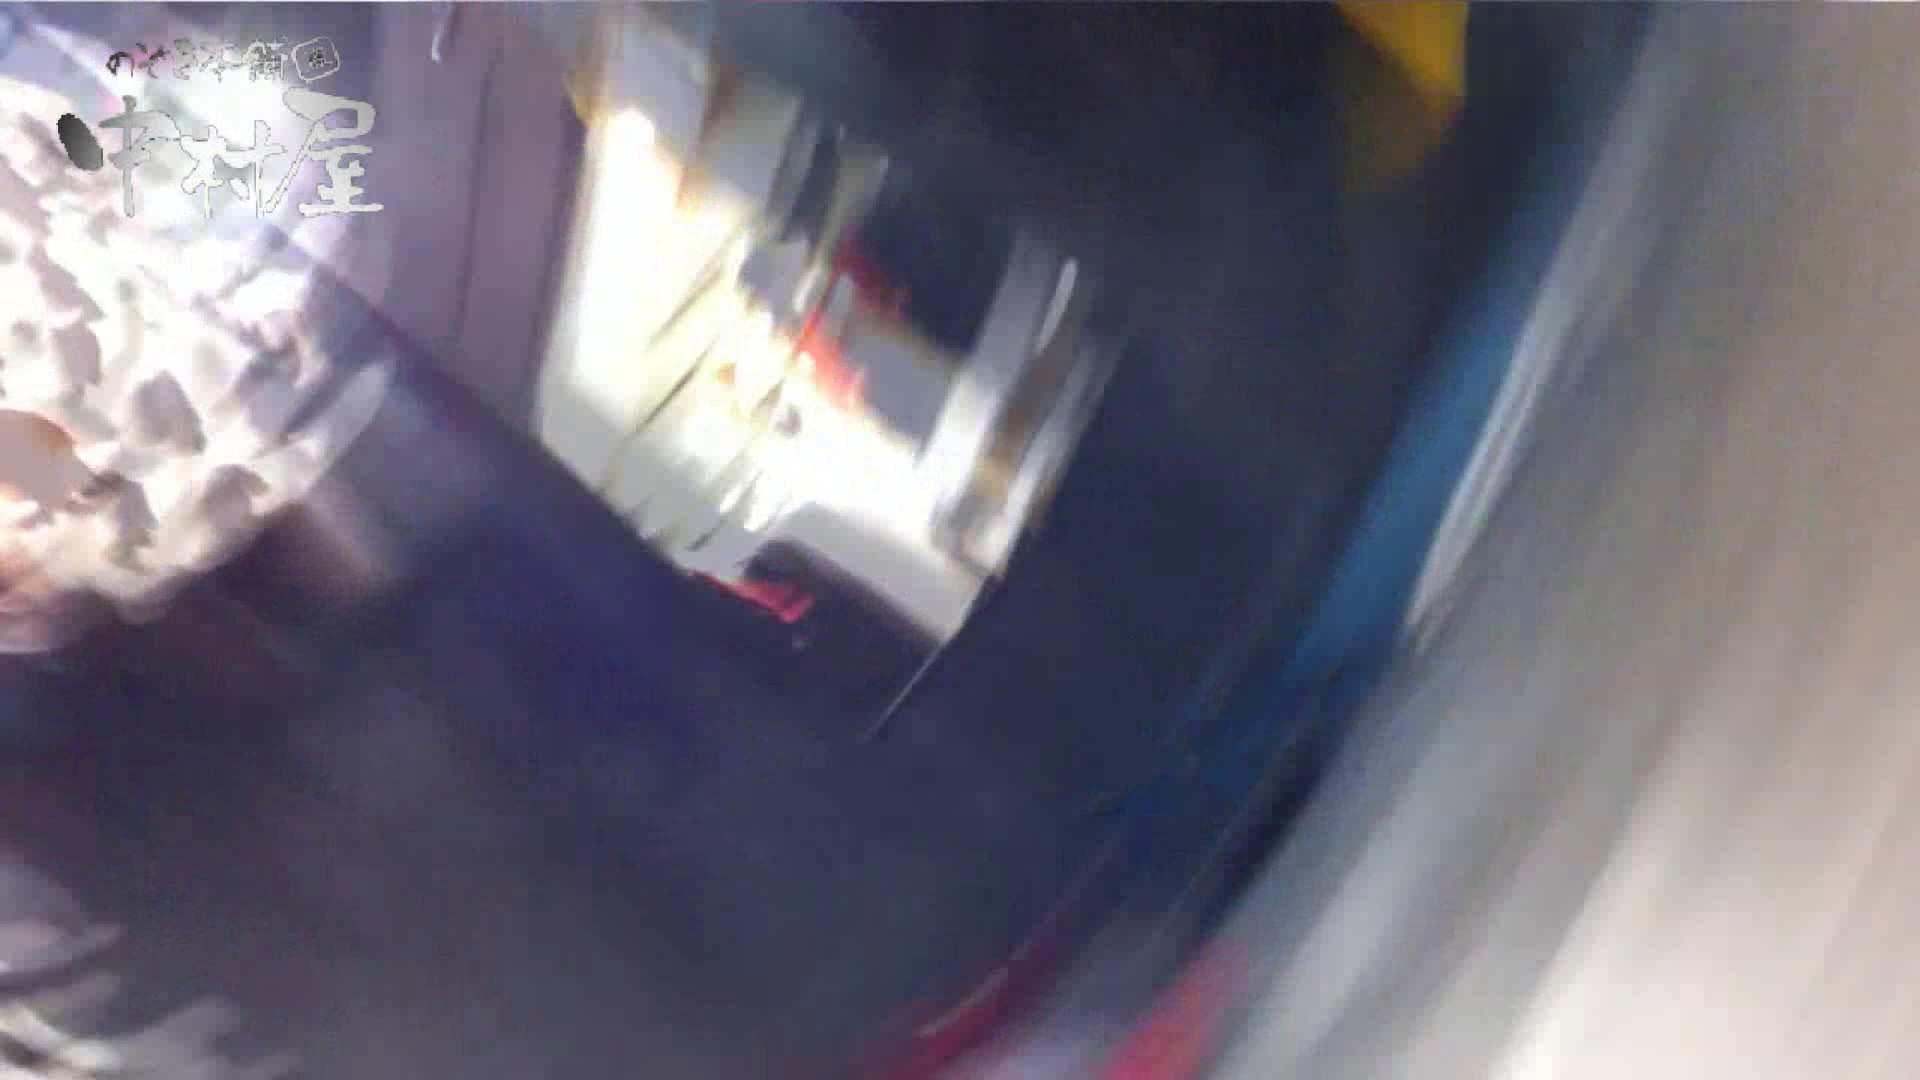 vol.48可愛いカリスマ店員胸チラ&パンチラ アニメ声の店員さん 胸チラ  96Pix 79